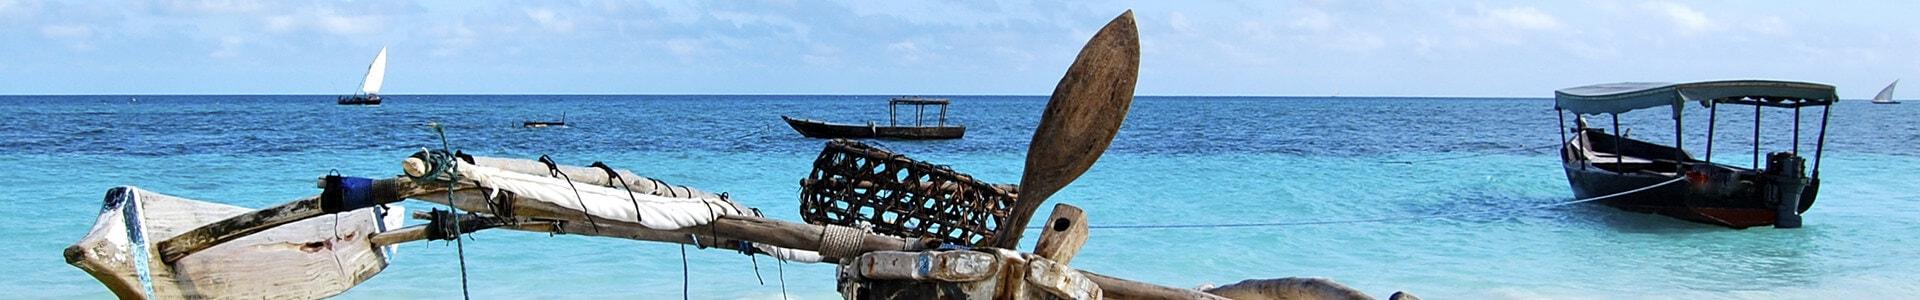 Voyage à Zanzibar - TUI